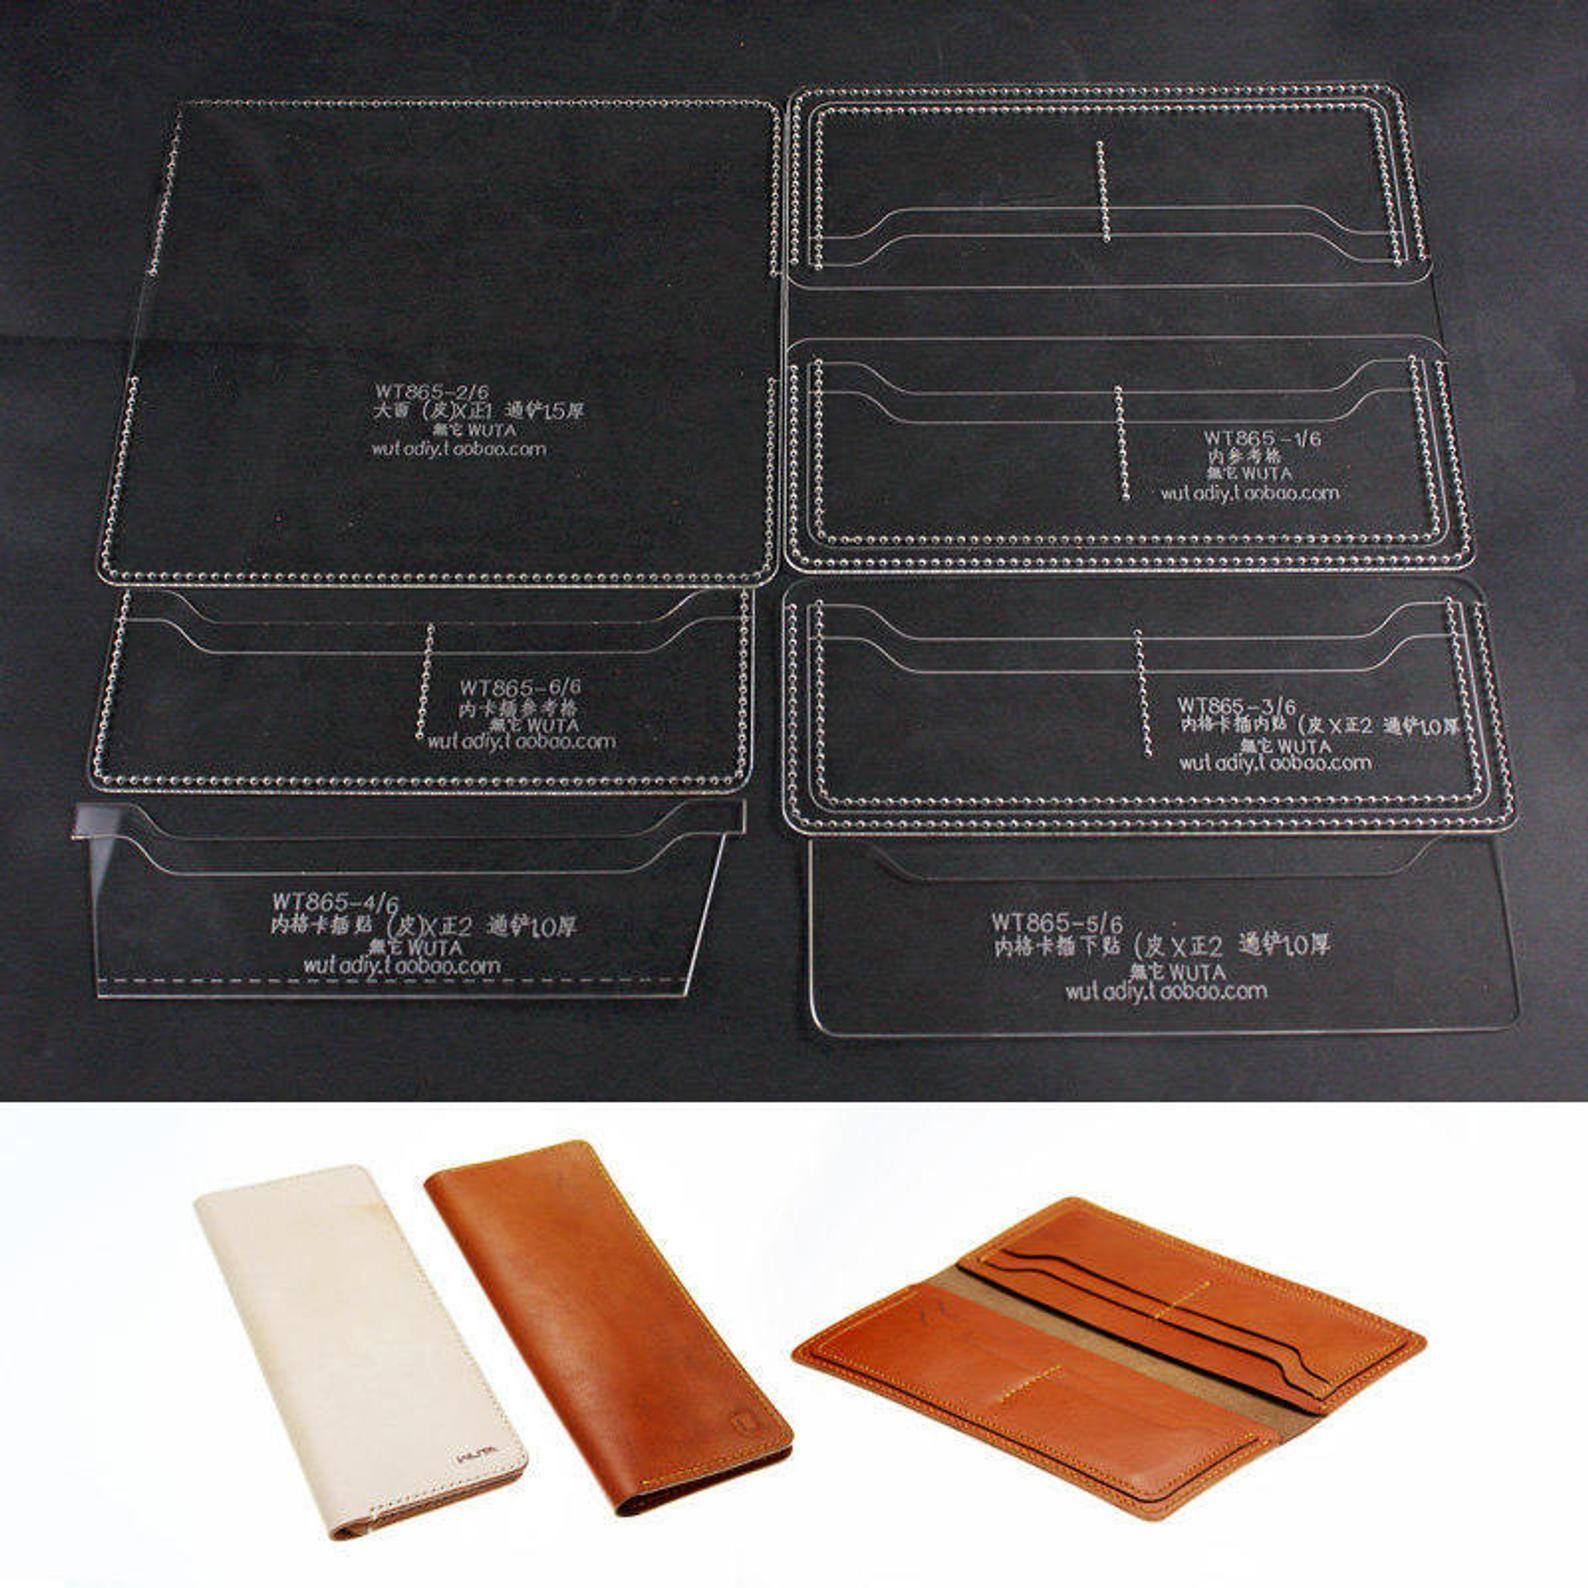 8 Slot Long Wallet Acrylic Leather Template Sets Leathercraft